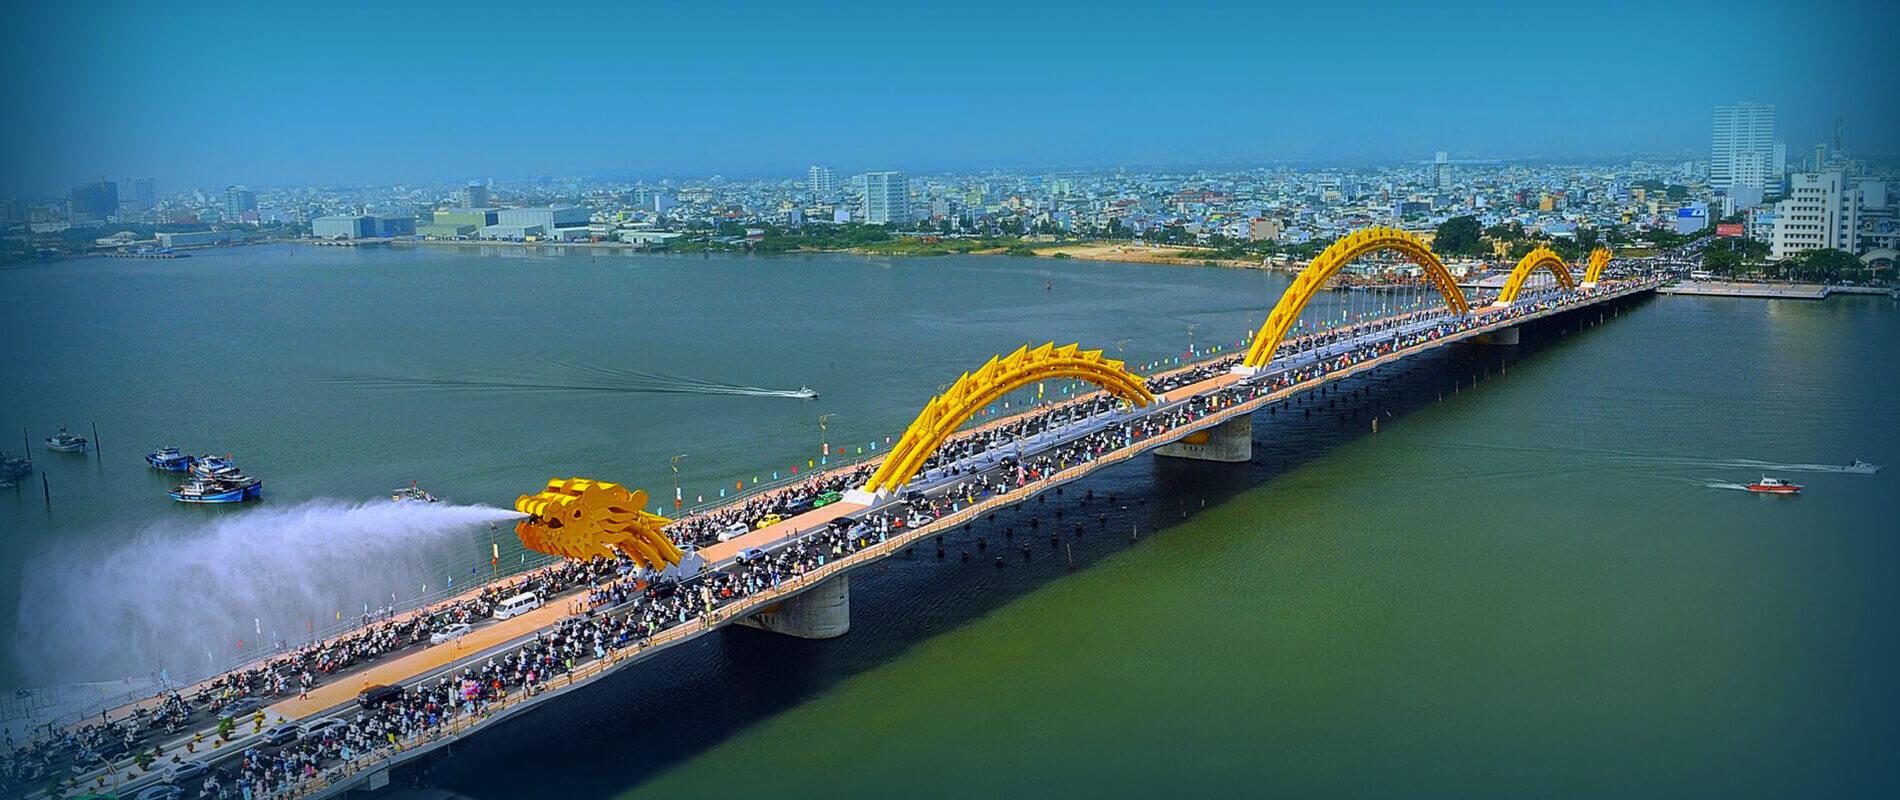 Explore Dragon Bridge in Da Nang City - Water Spraying